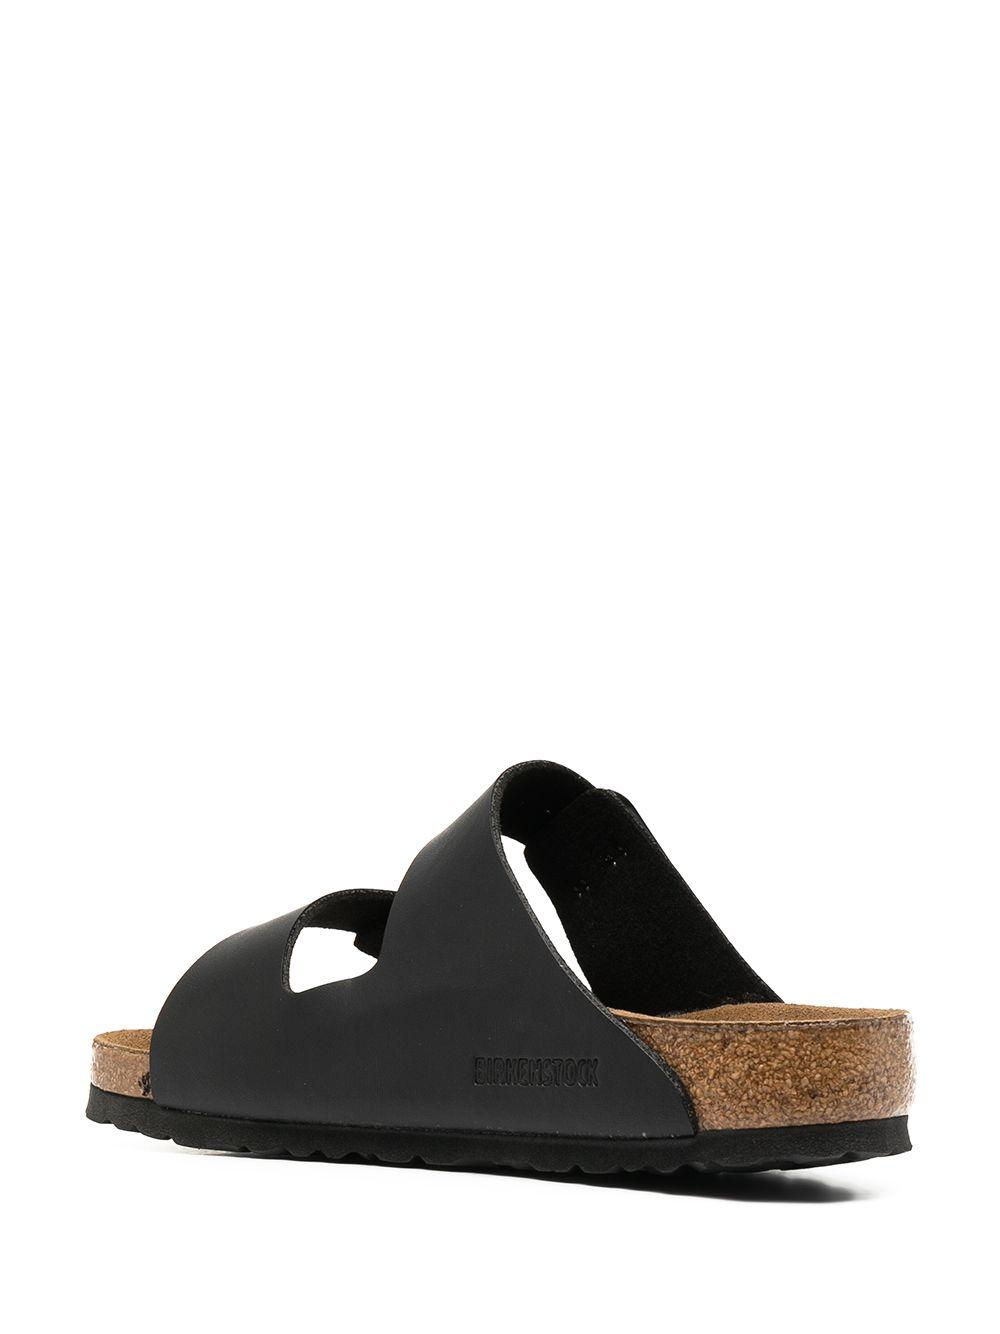 Birkenstock sandali arizona uomo nero BIRKENSTOCK | Sandali | 551253BLACK